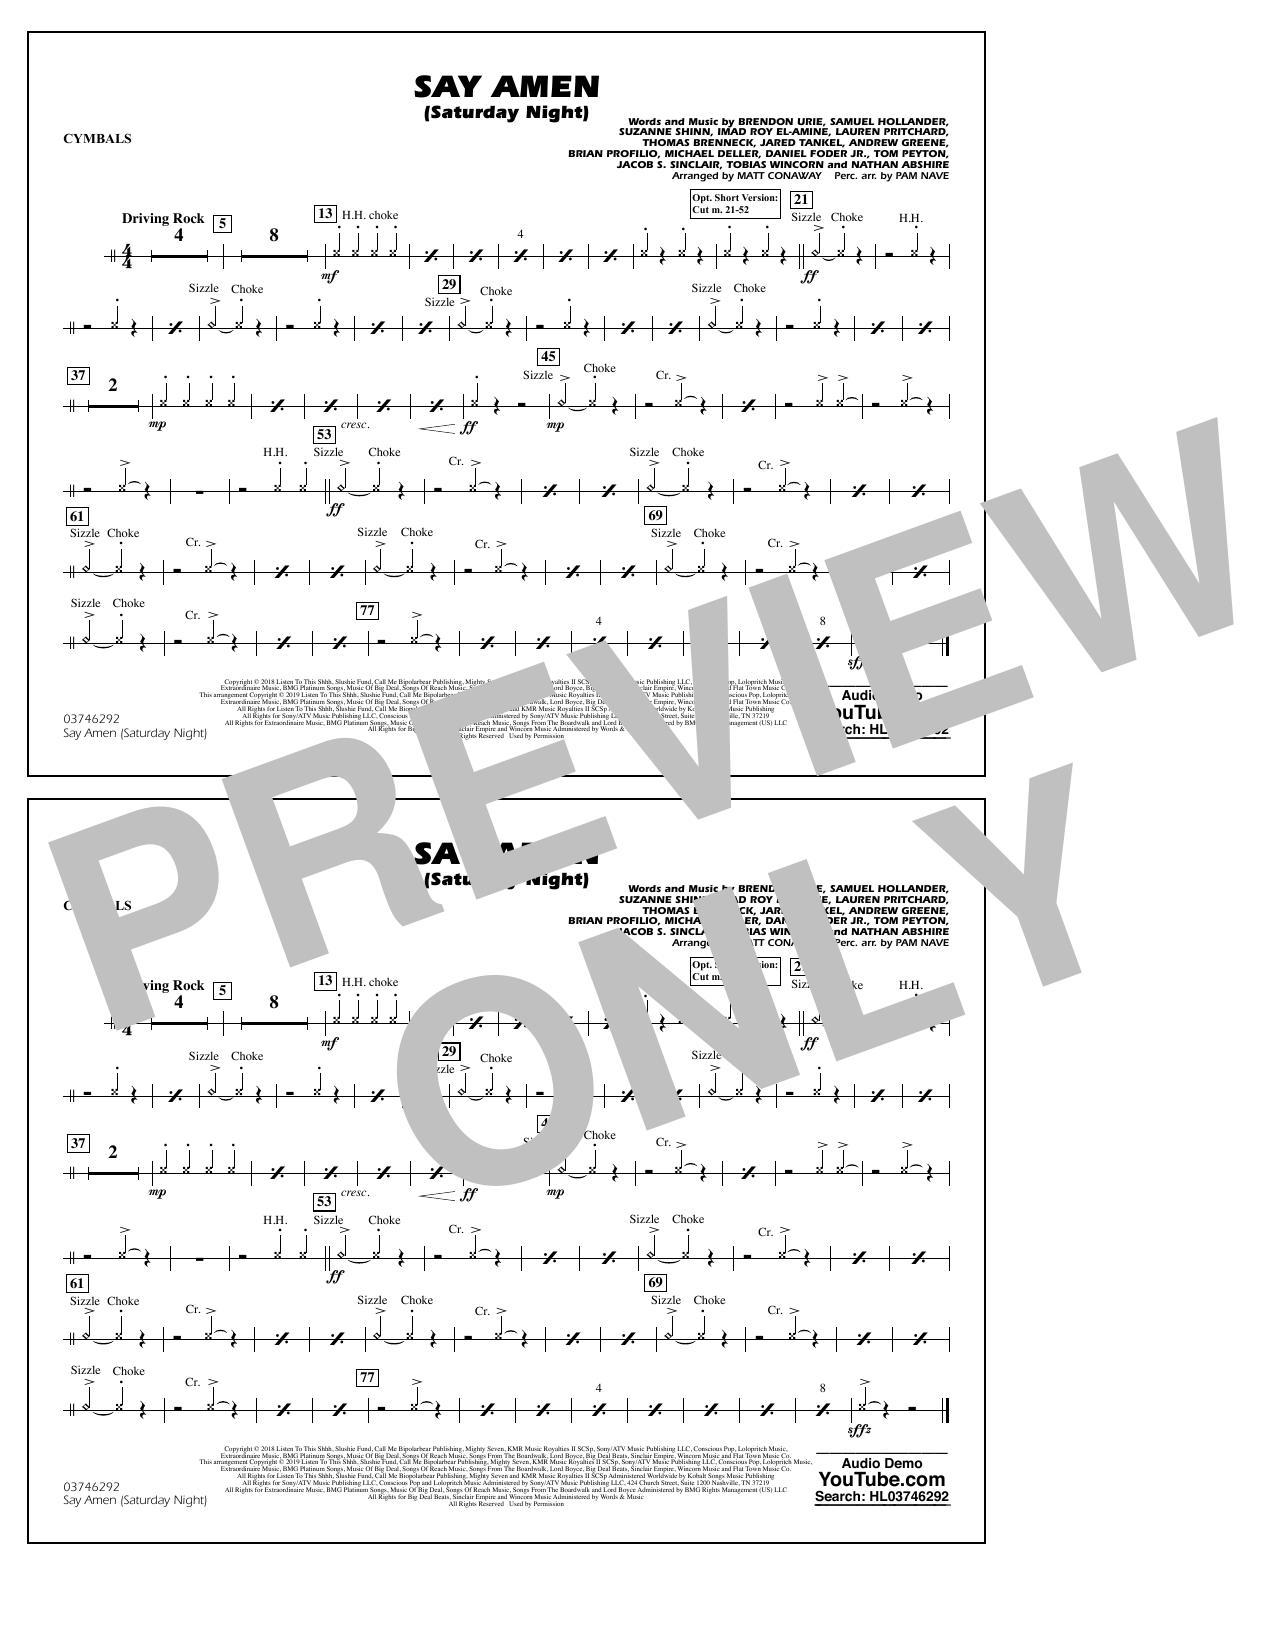 Panic At The Disco Say Amen Saturday Night arr. Matt Conaway   Cymbals  Sheet Music Notes, Chords   Download Printable Marching Band PDF Score   ...